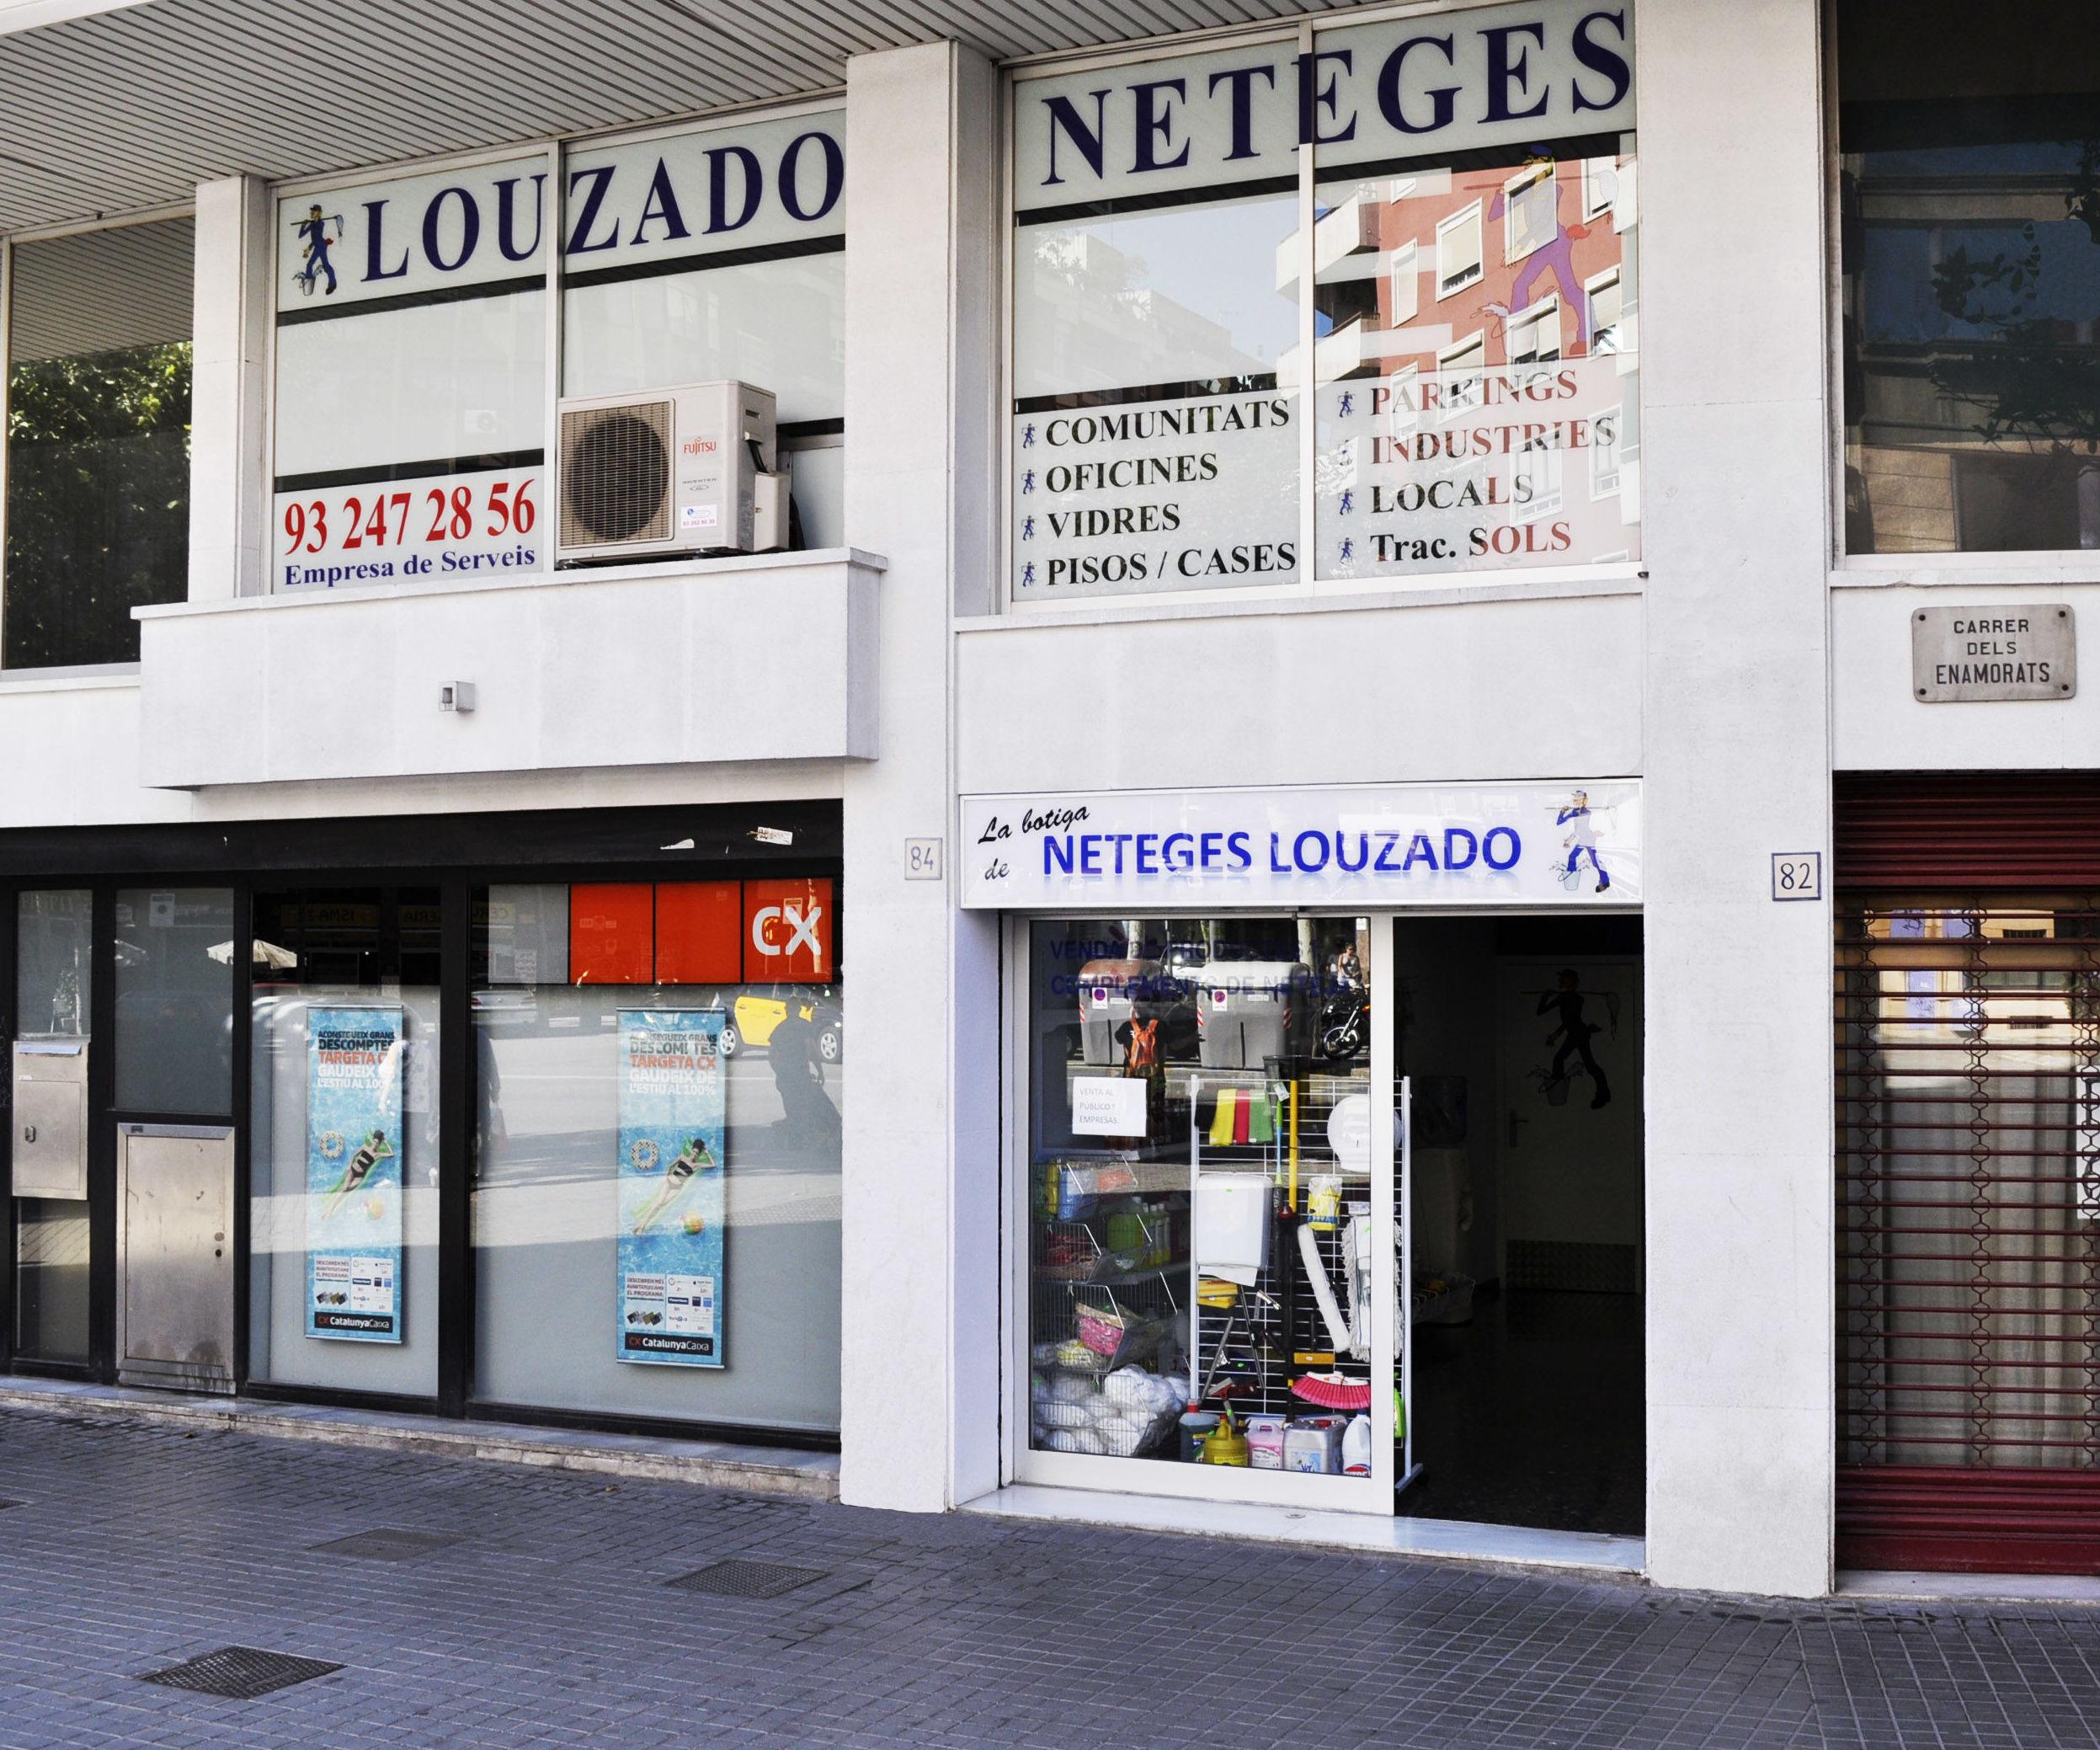 Foto 1 de Limpieza (empresas) en Barcelona | Neteges Louzado, S.L.